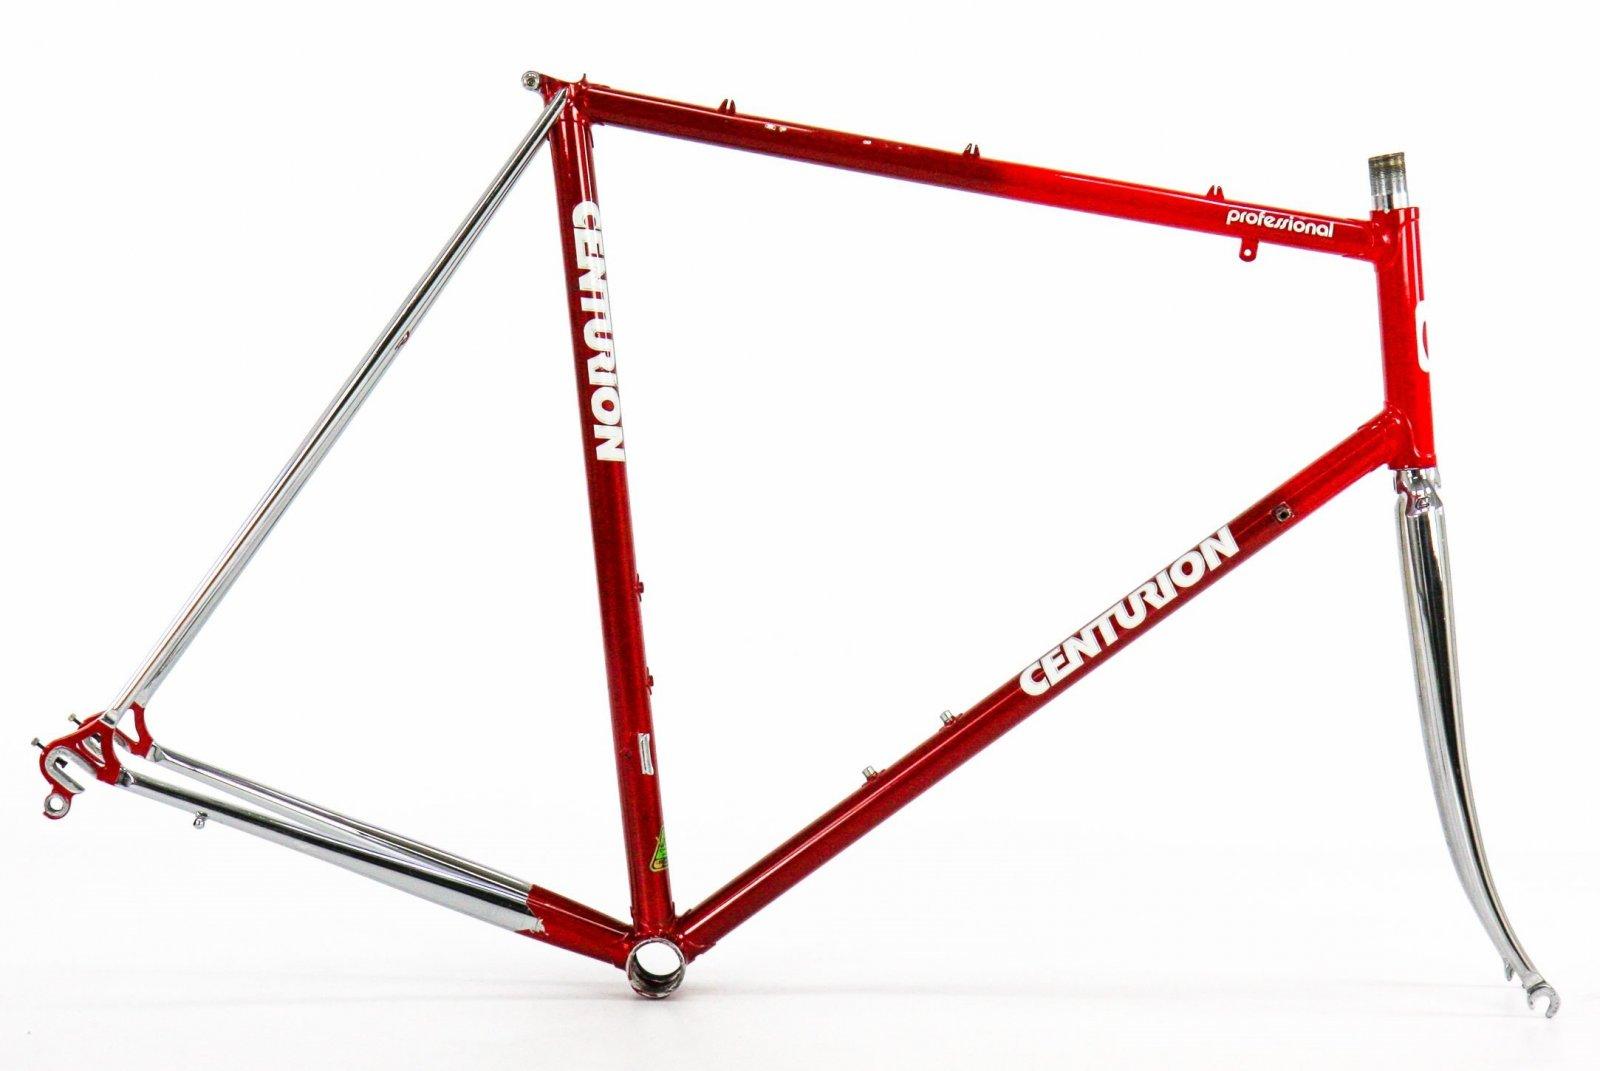 centurion-professional-classic-bicycle-frameset-1.jpg